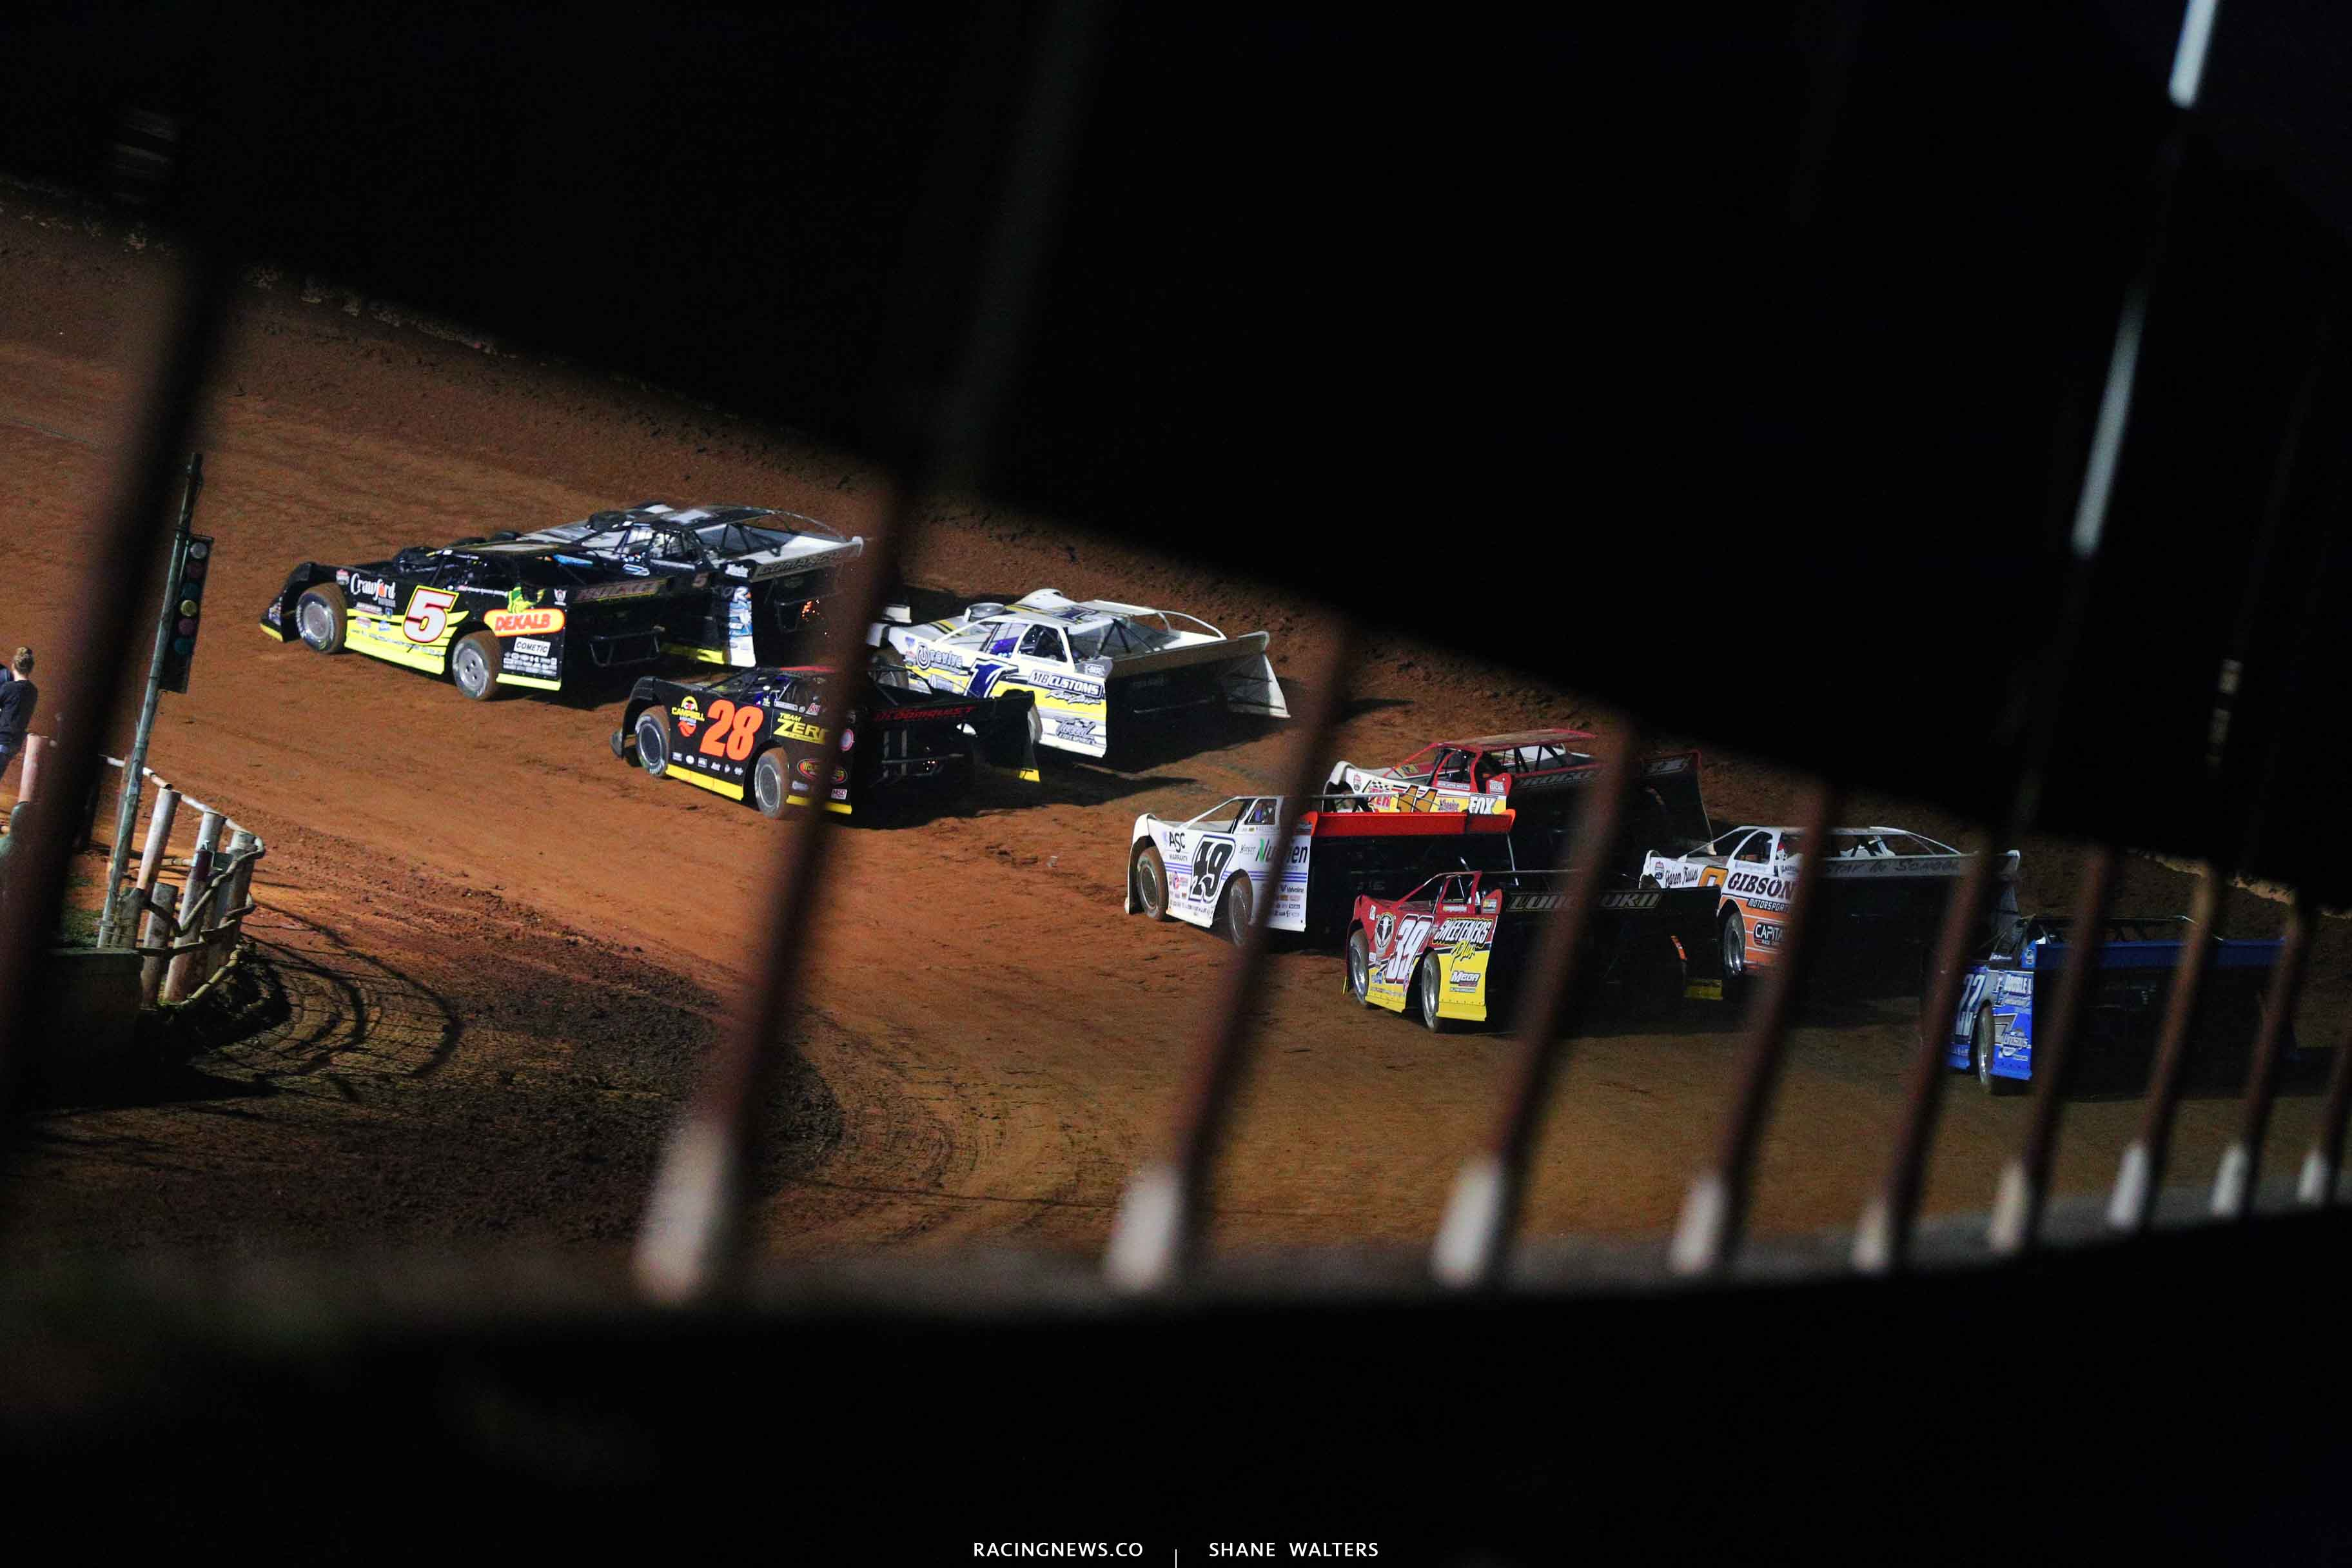 Michael Norris, Ryan King, Jeff Wolfenbarger, Jonathan Davenport and Tim McCreadie at Tazewell Speedway 6538